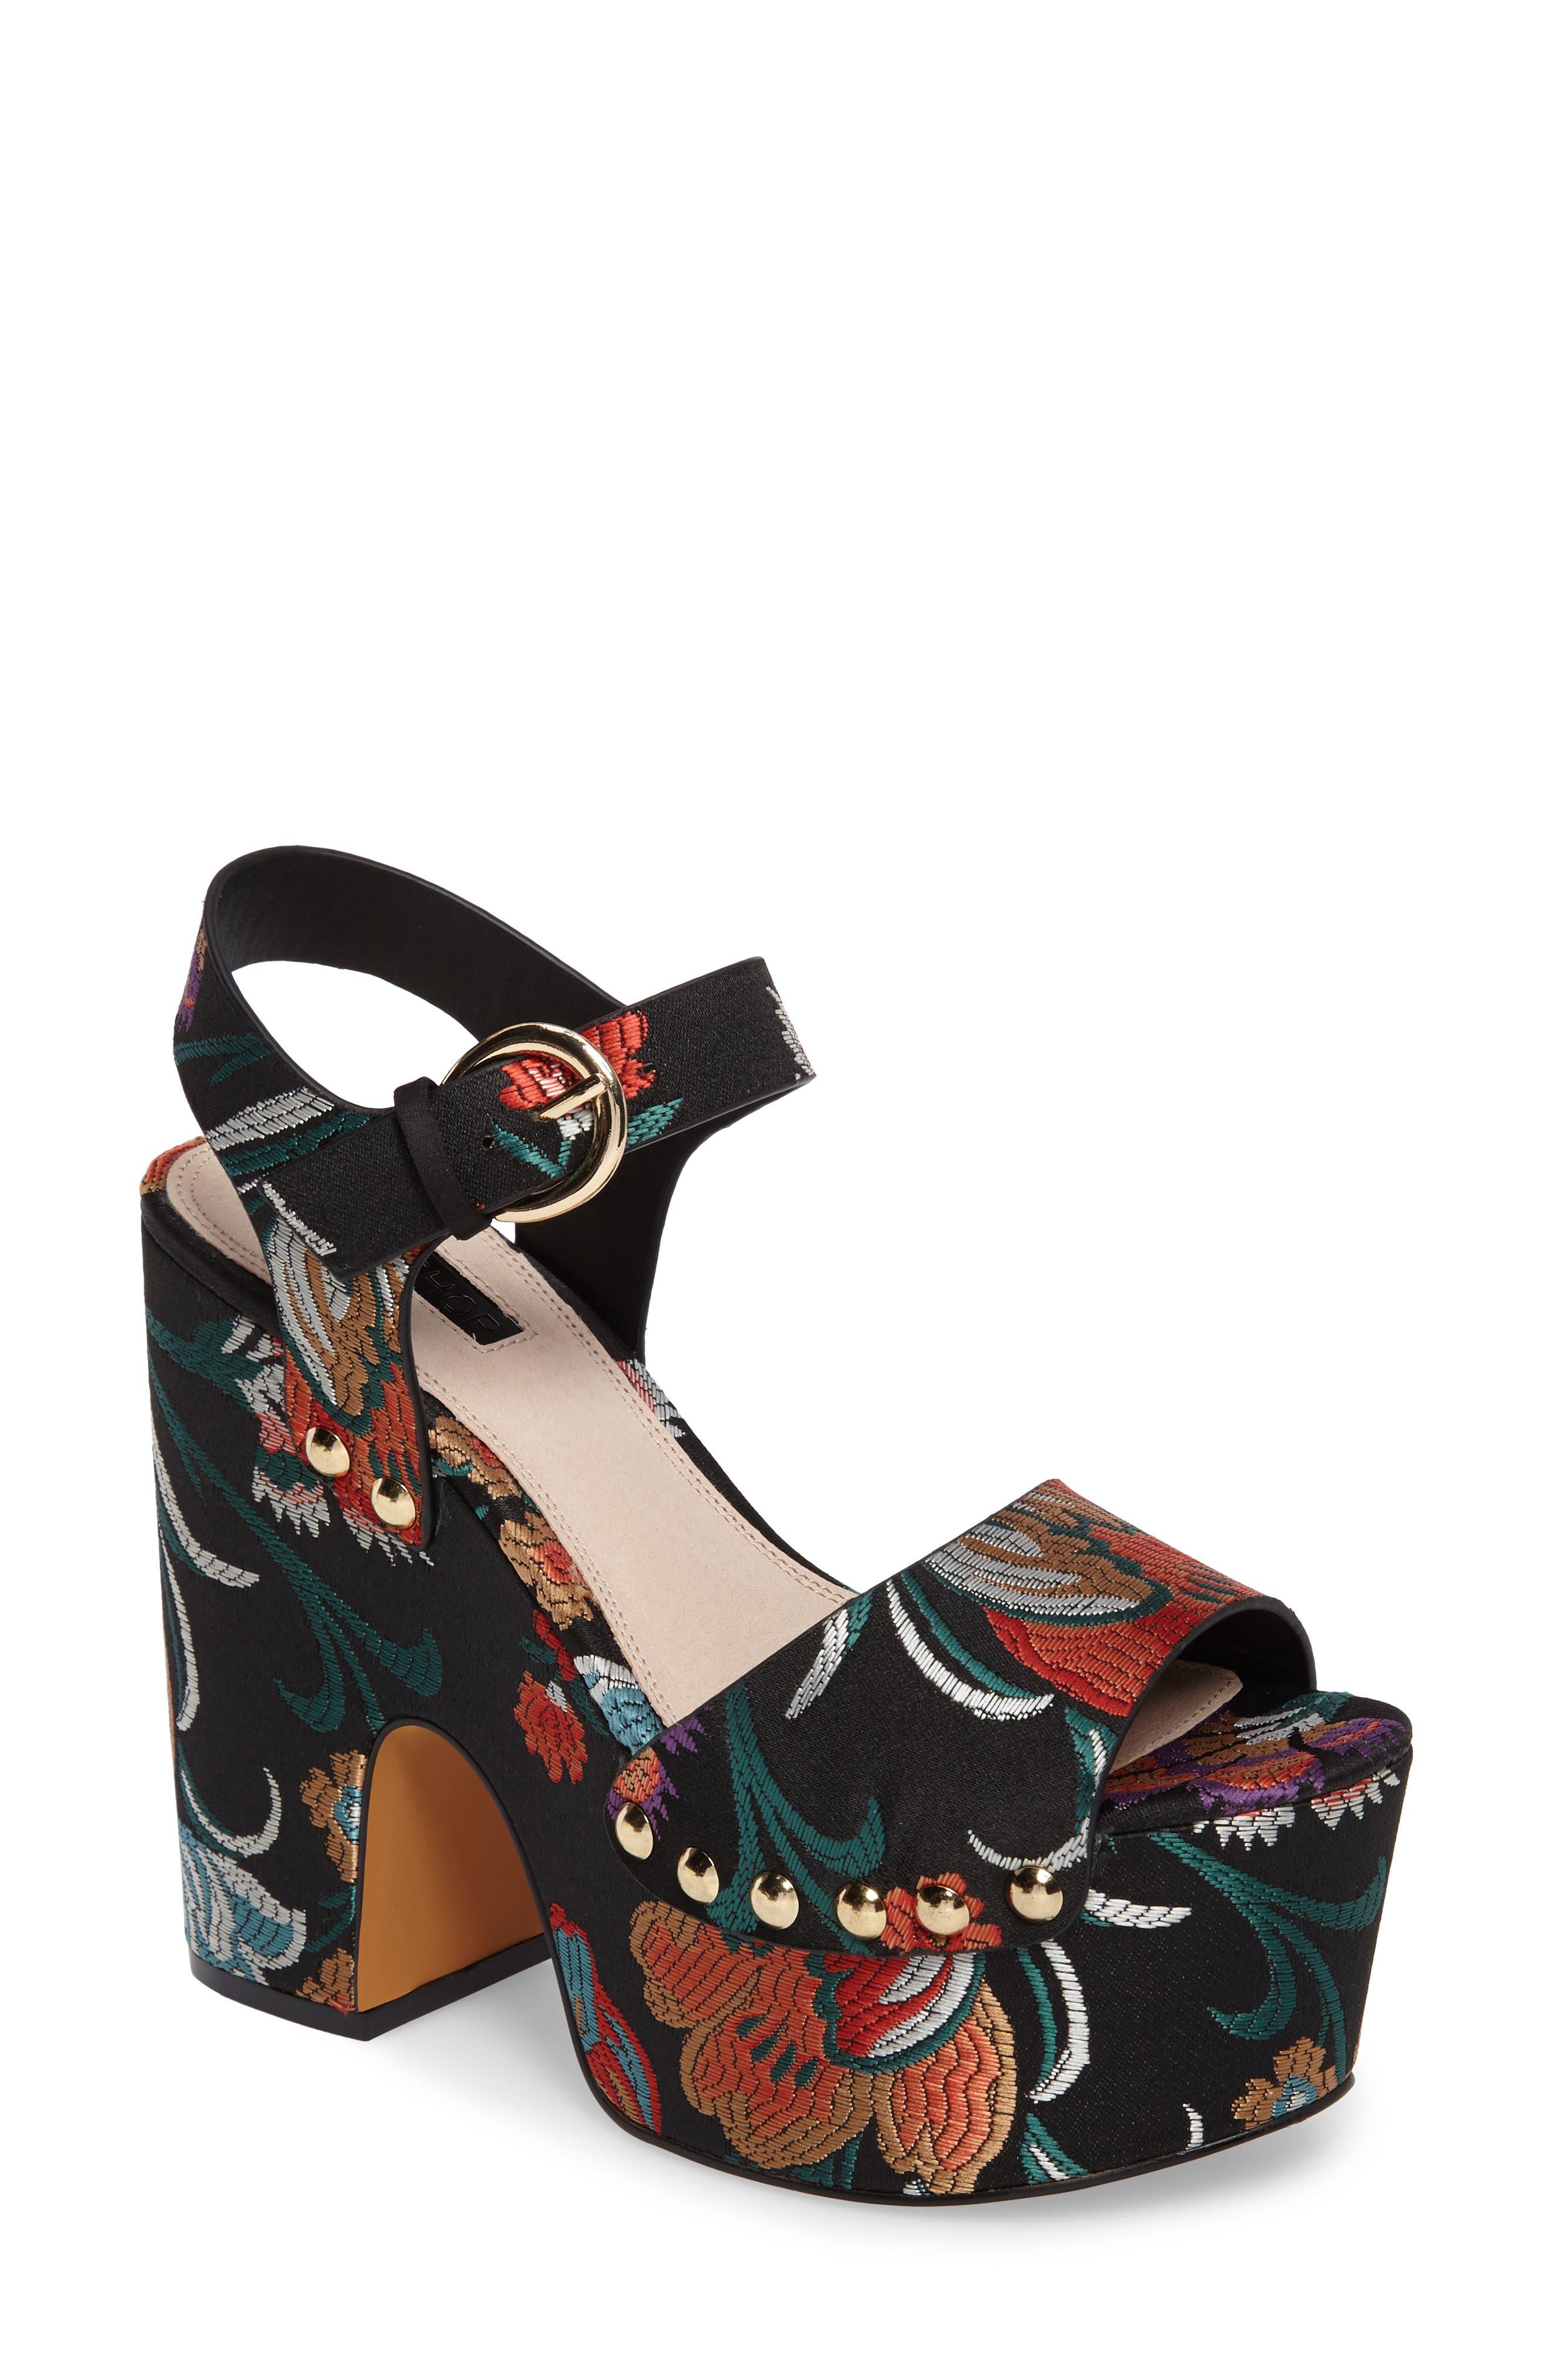 Lourdes Embroidered Platform Sandal,                             Main thumbnail 1, color,                             001